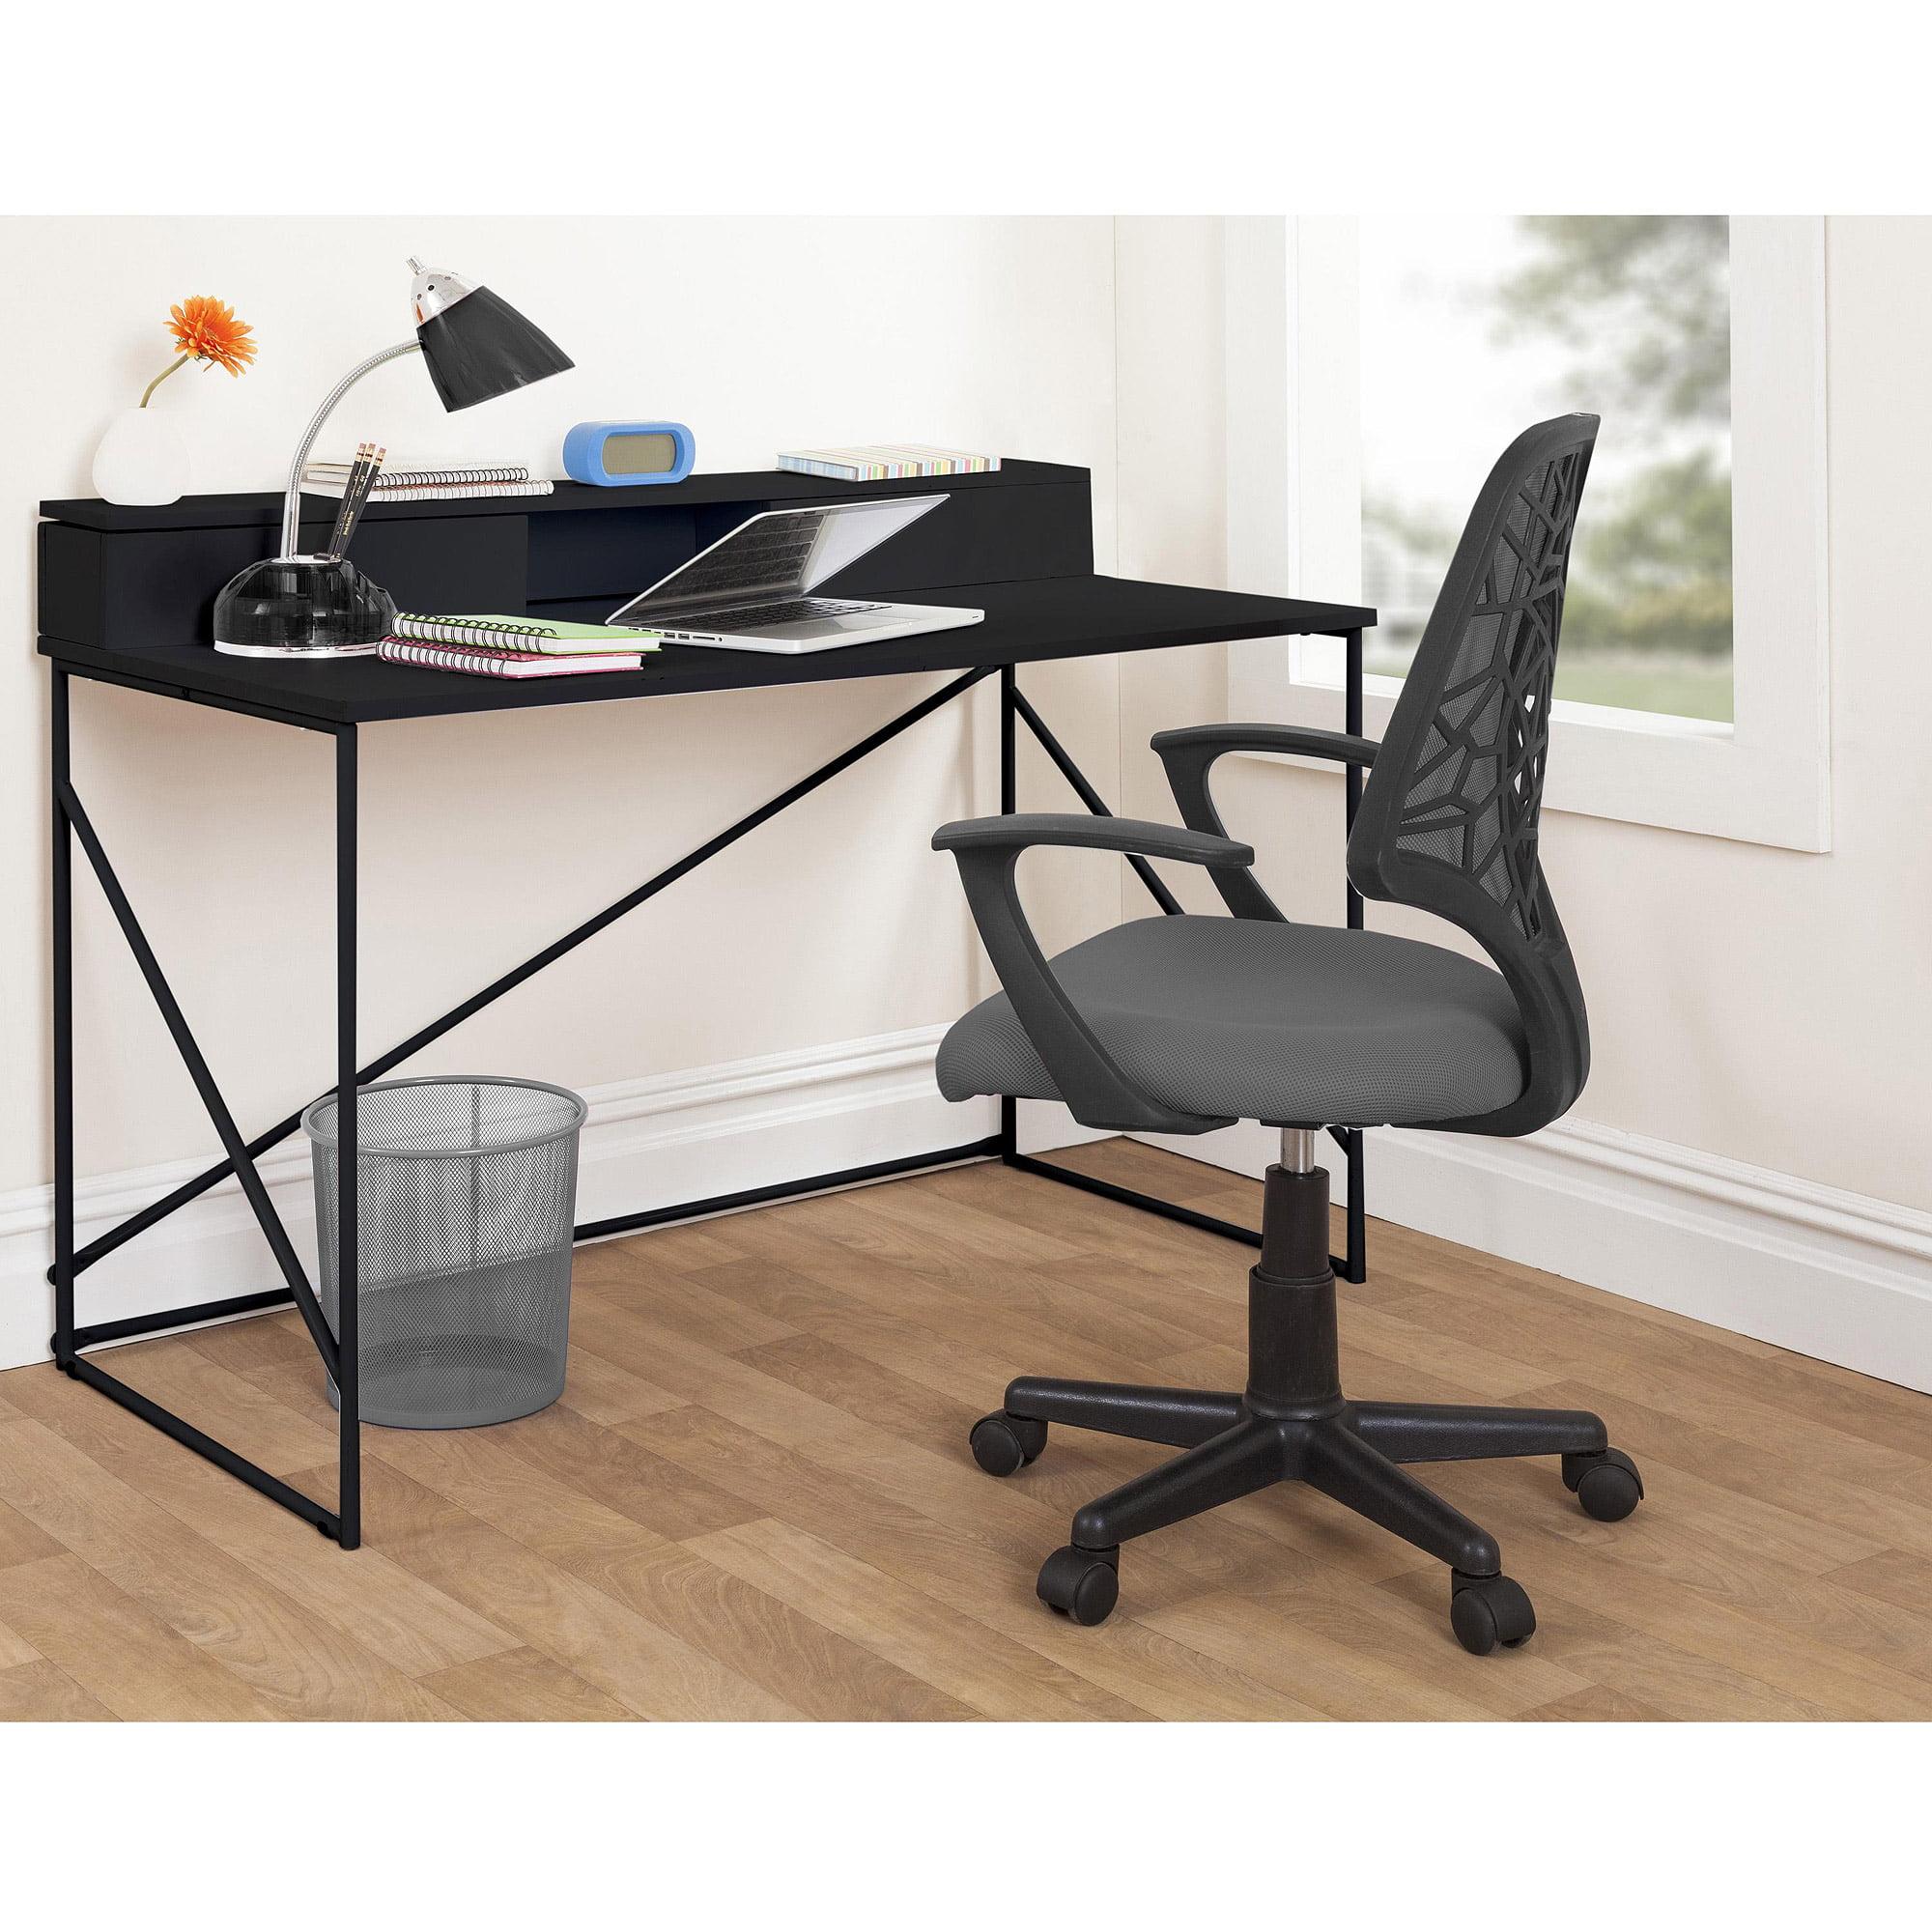 sc 1 st  Walmart & your zone flip-top desk multiple colors - Walmart.com